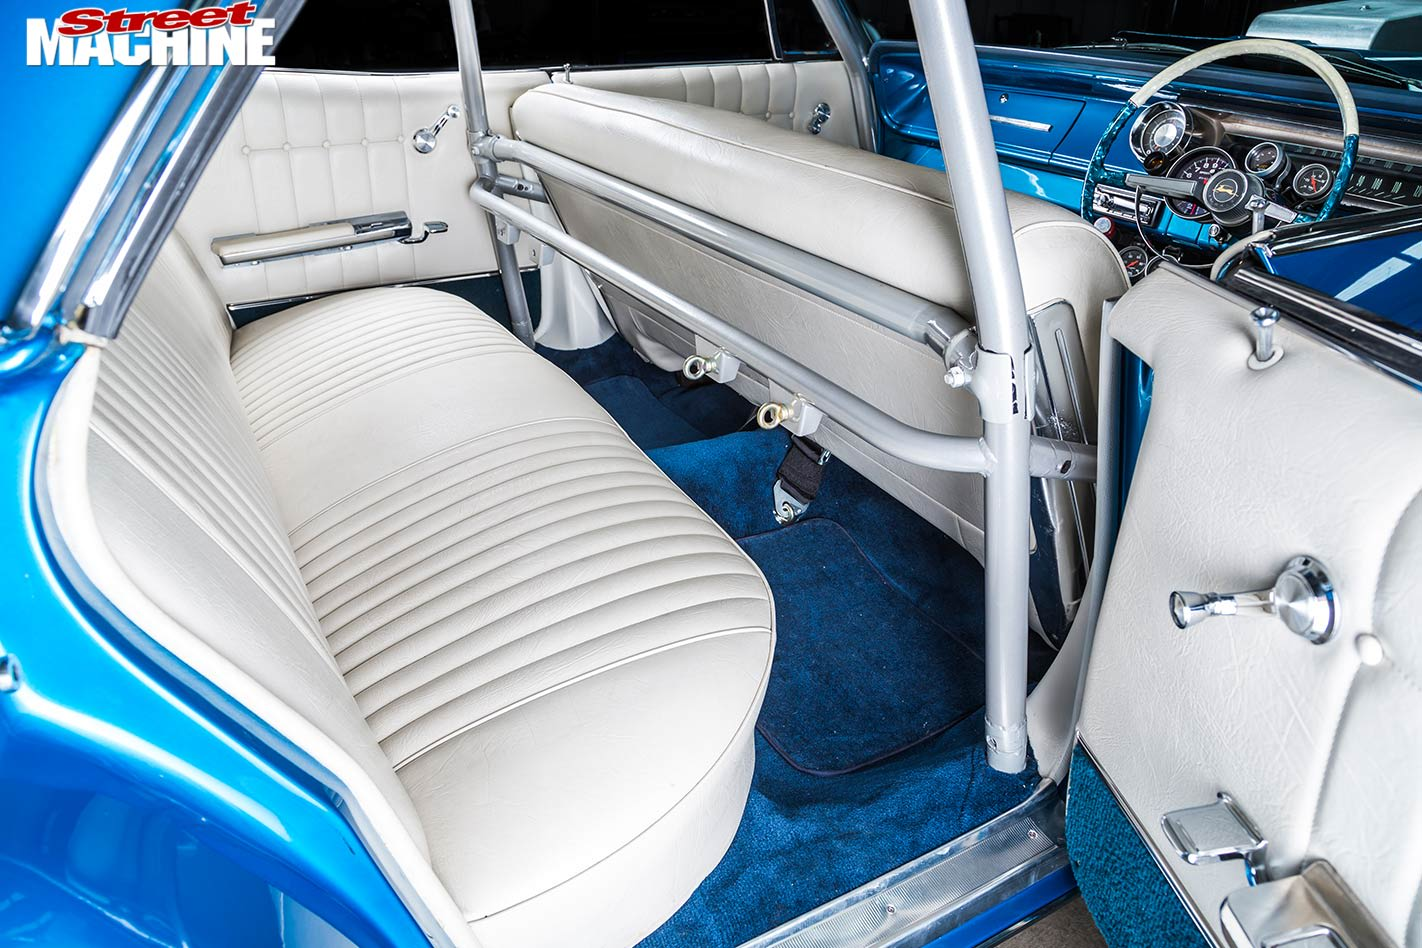 Chev Impala interior rear